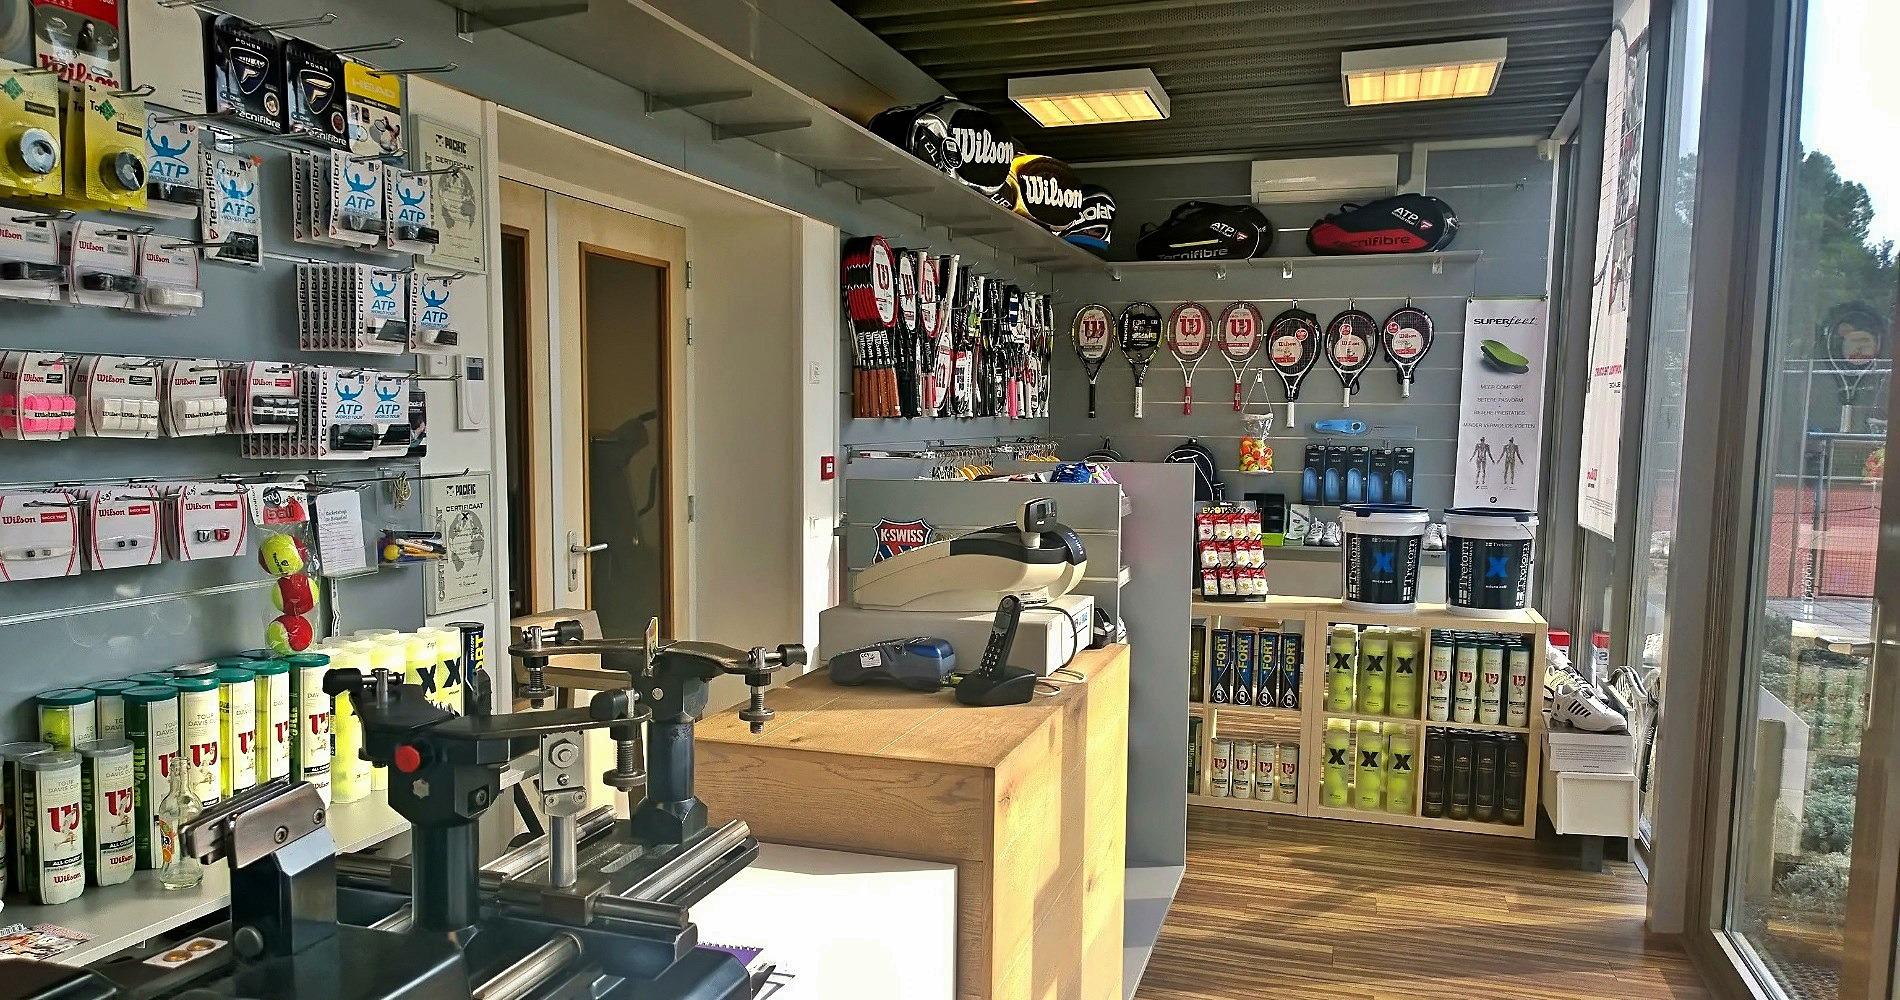 Racketshop Den Haag - Specialist in tennisartikelen - www.tennisshop-denhaag.nl